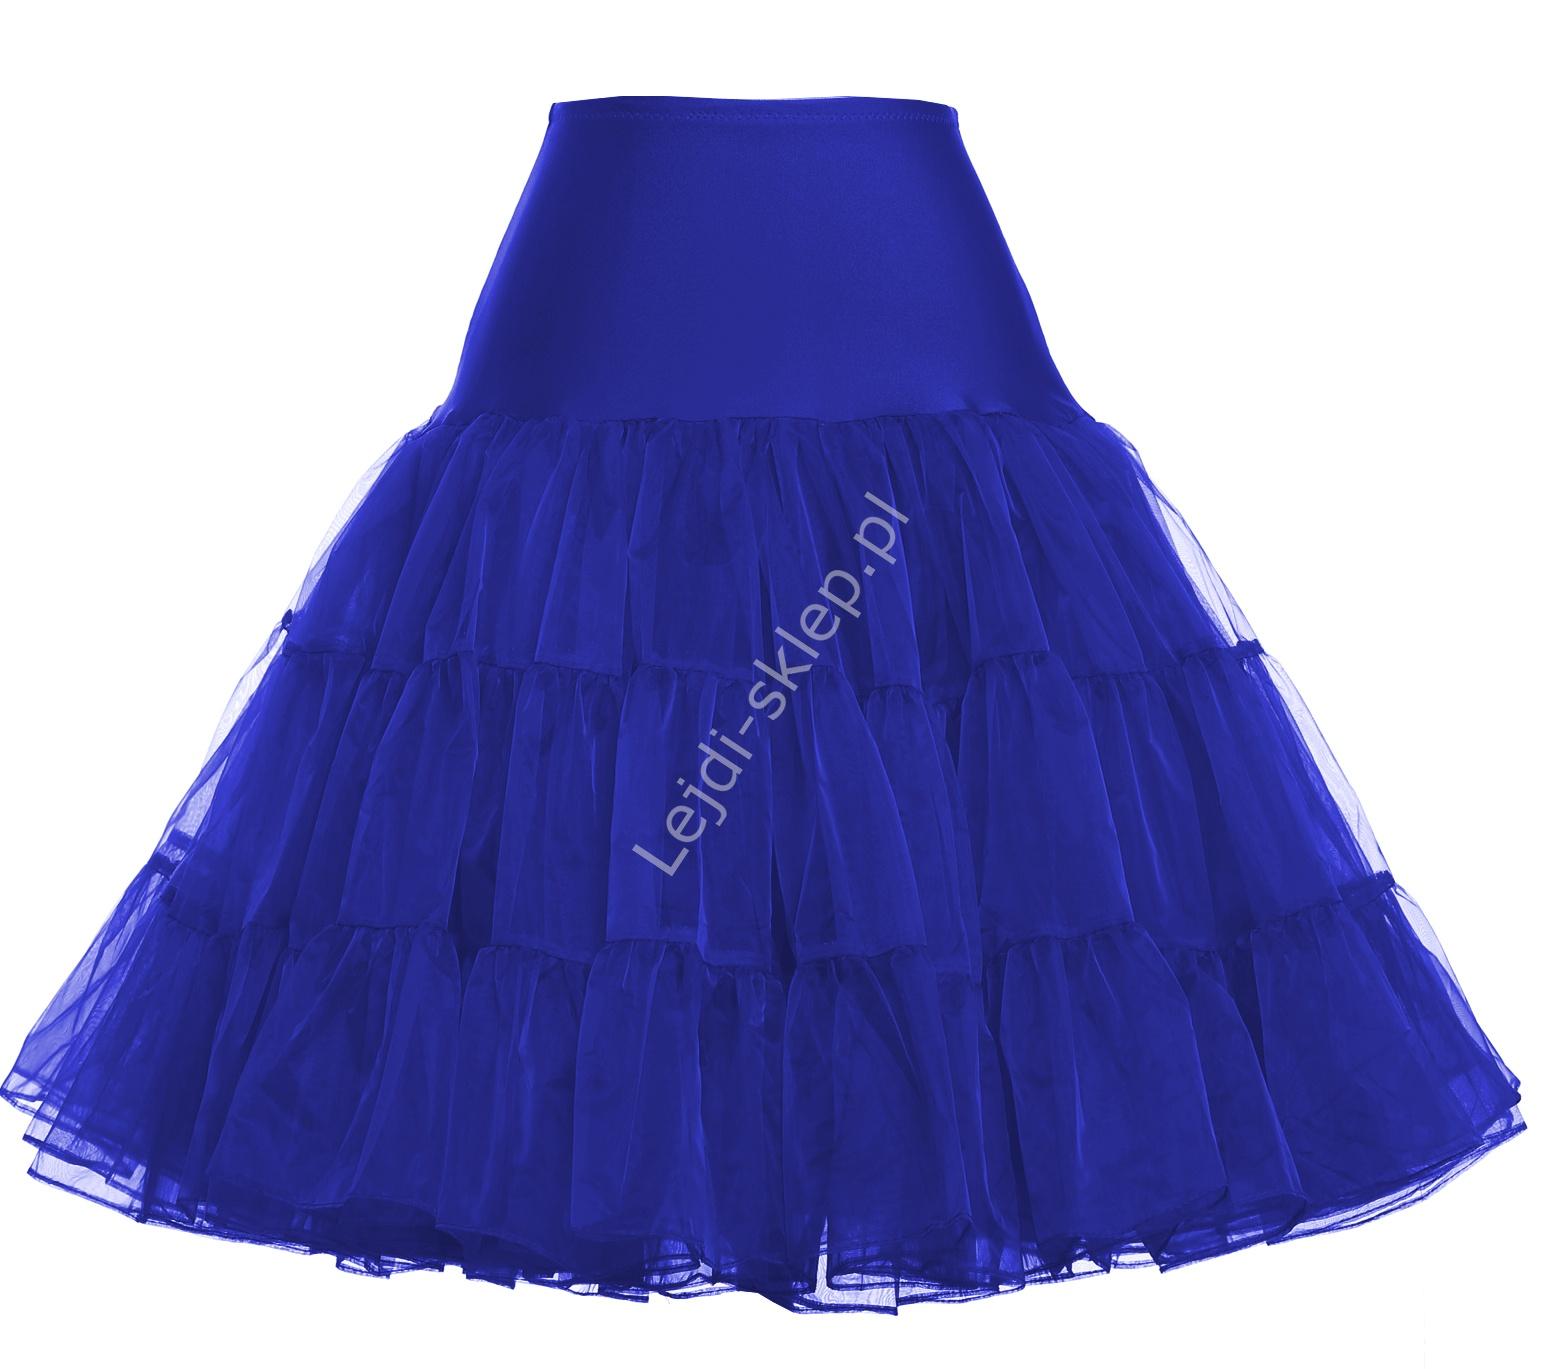 Niebieska spódnica Pin-Up, niebieska halka pod sukienkę | niebieskie halki do sukienek pin-up - Lejdi